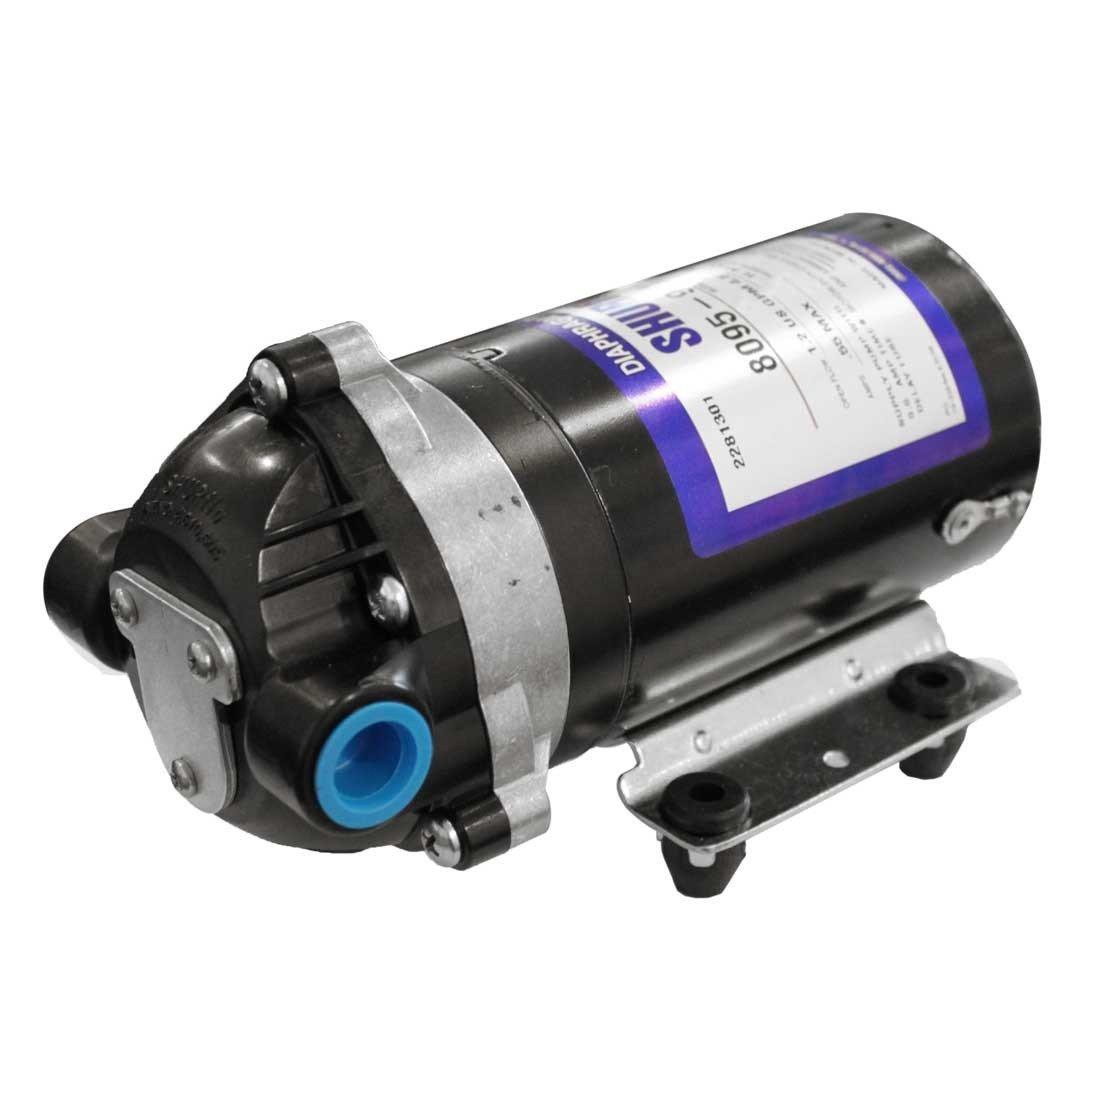 Shurflo Water Pump >> 135 Psi Shurflo Water Pump